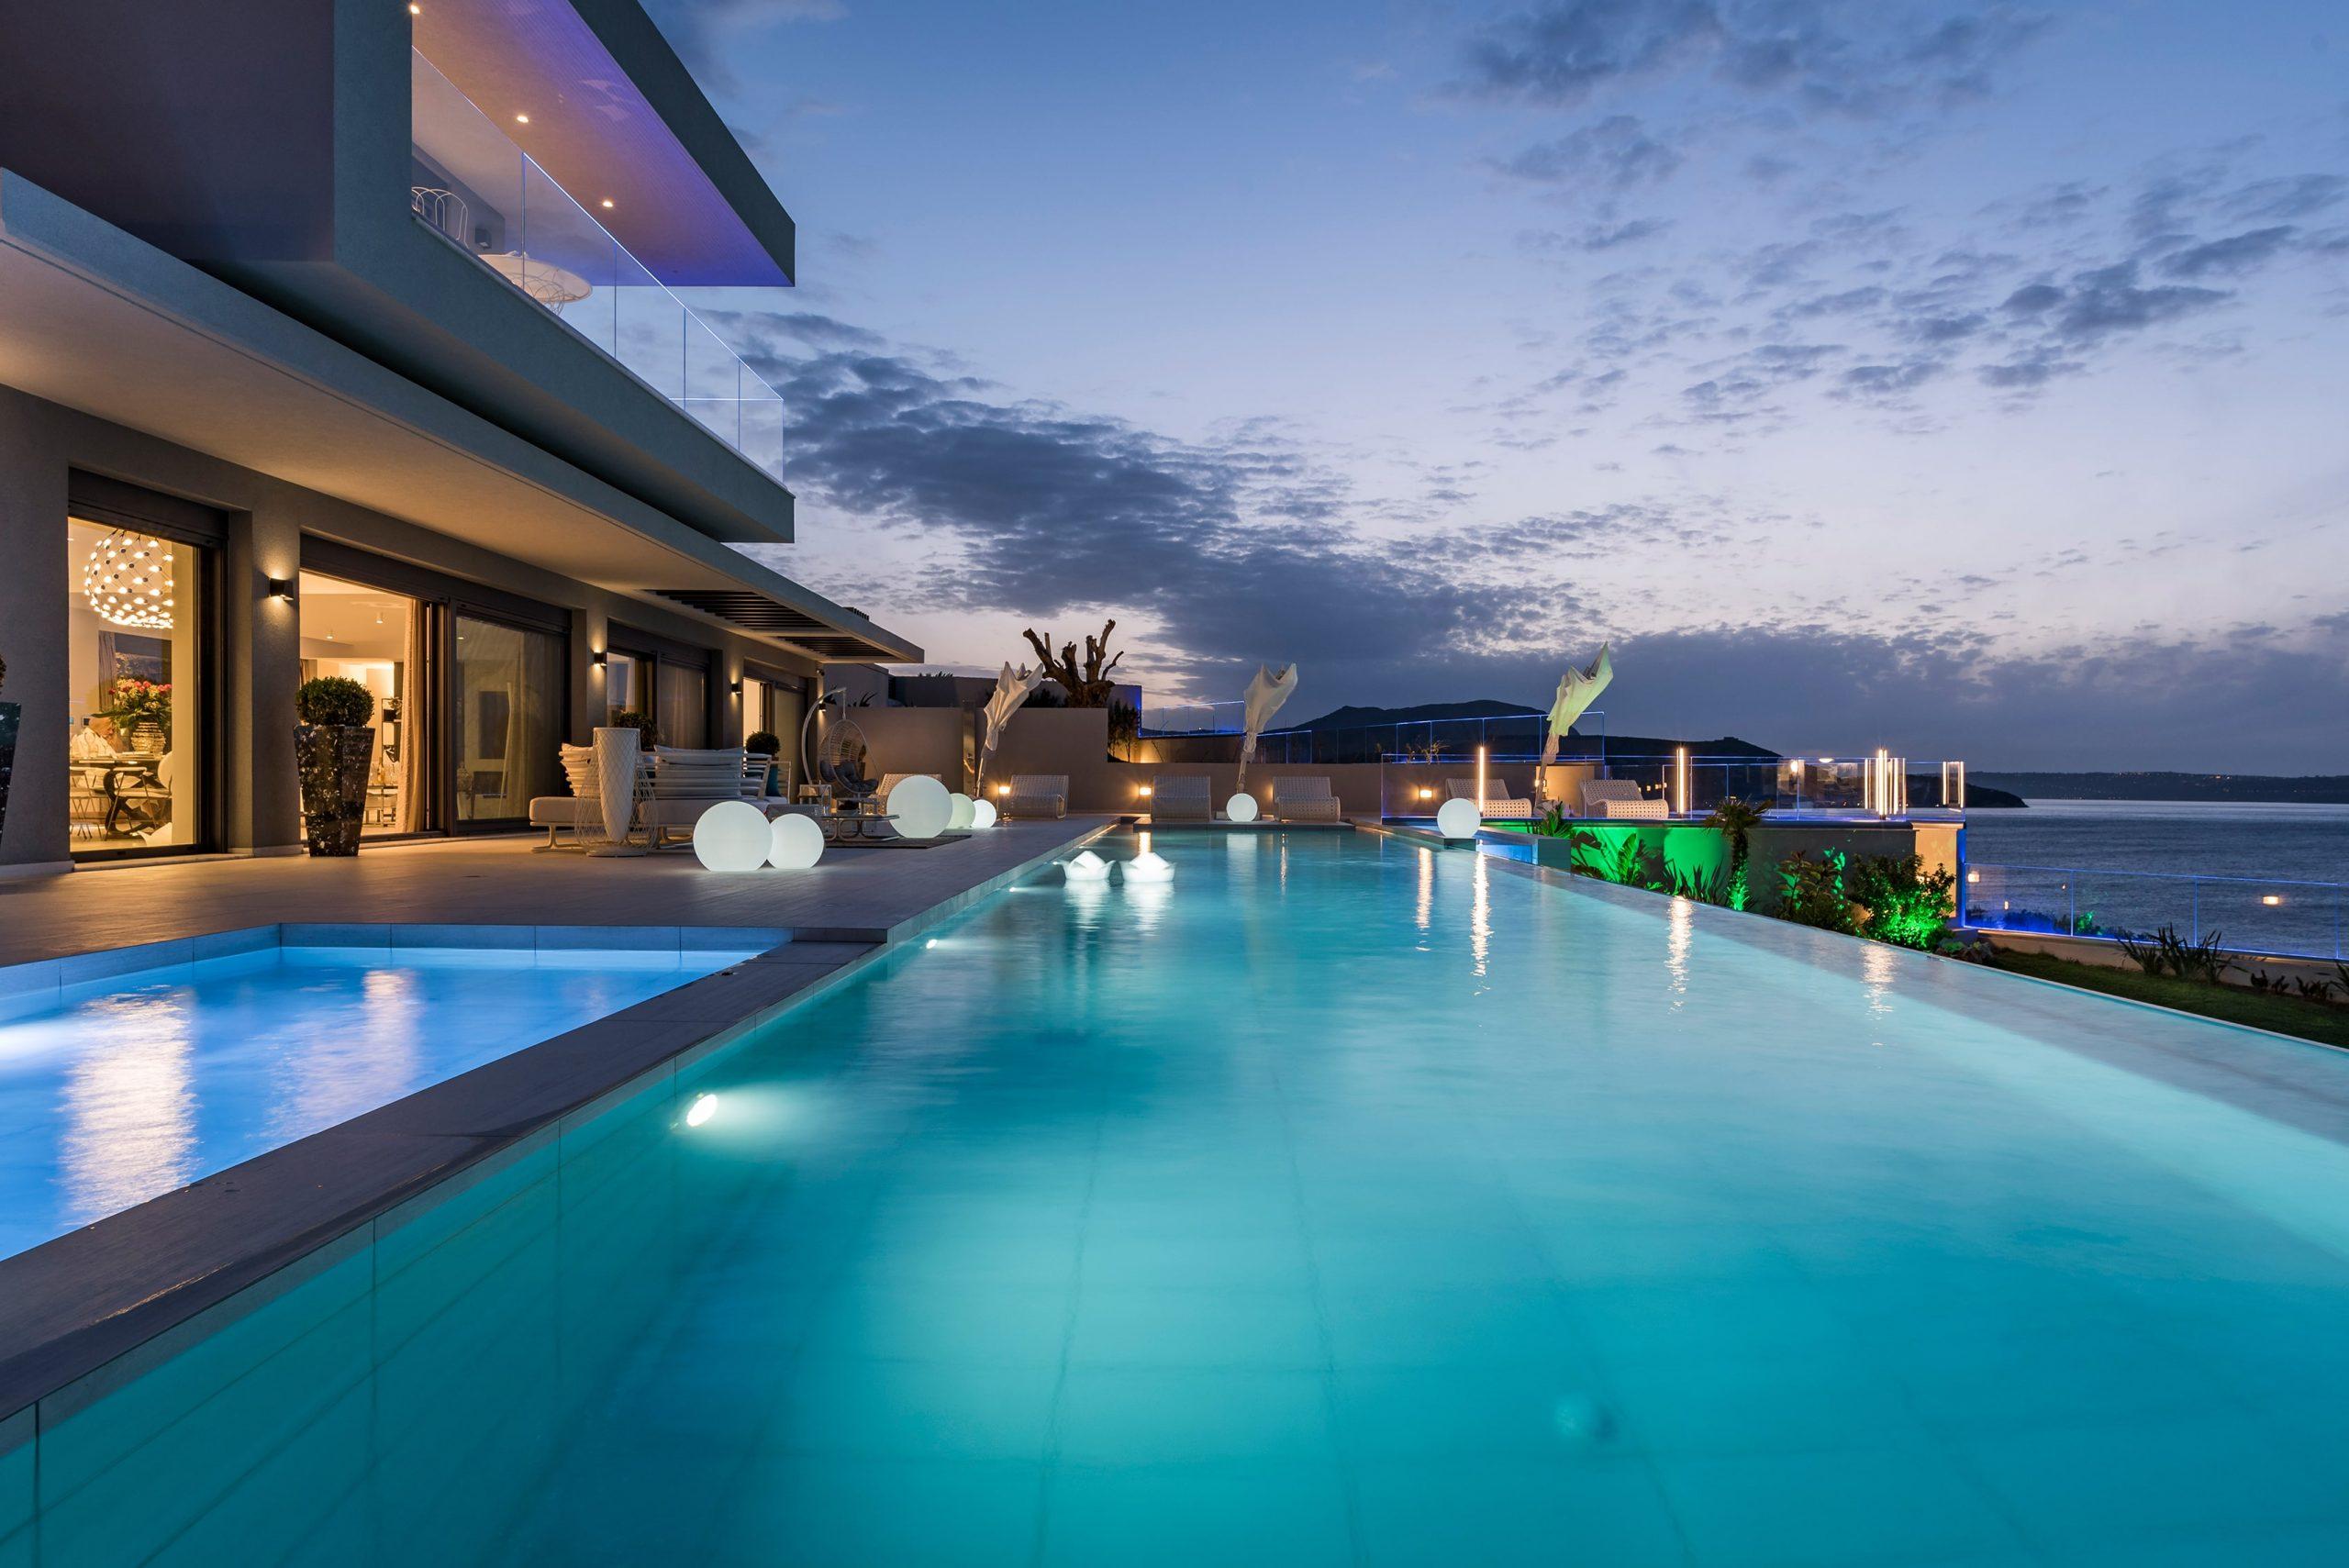 Luxury Villas in Crete- Kyriakidis Luxury Villas in Chania- Crete